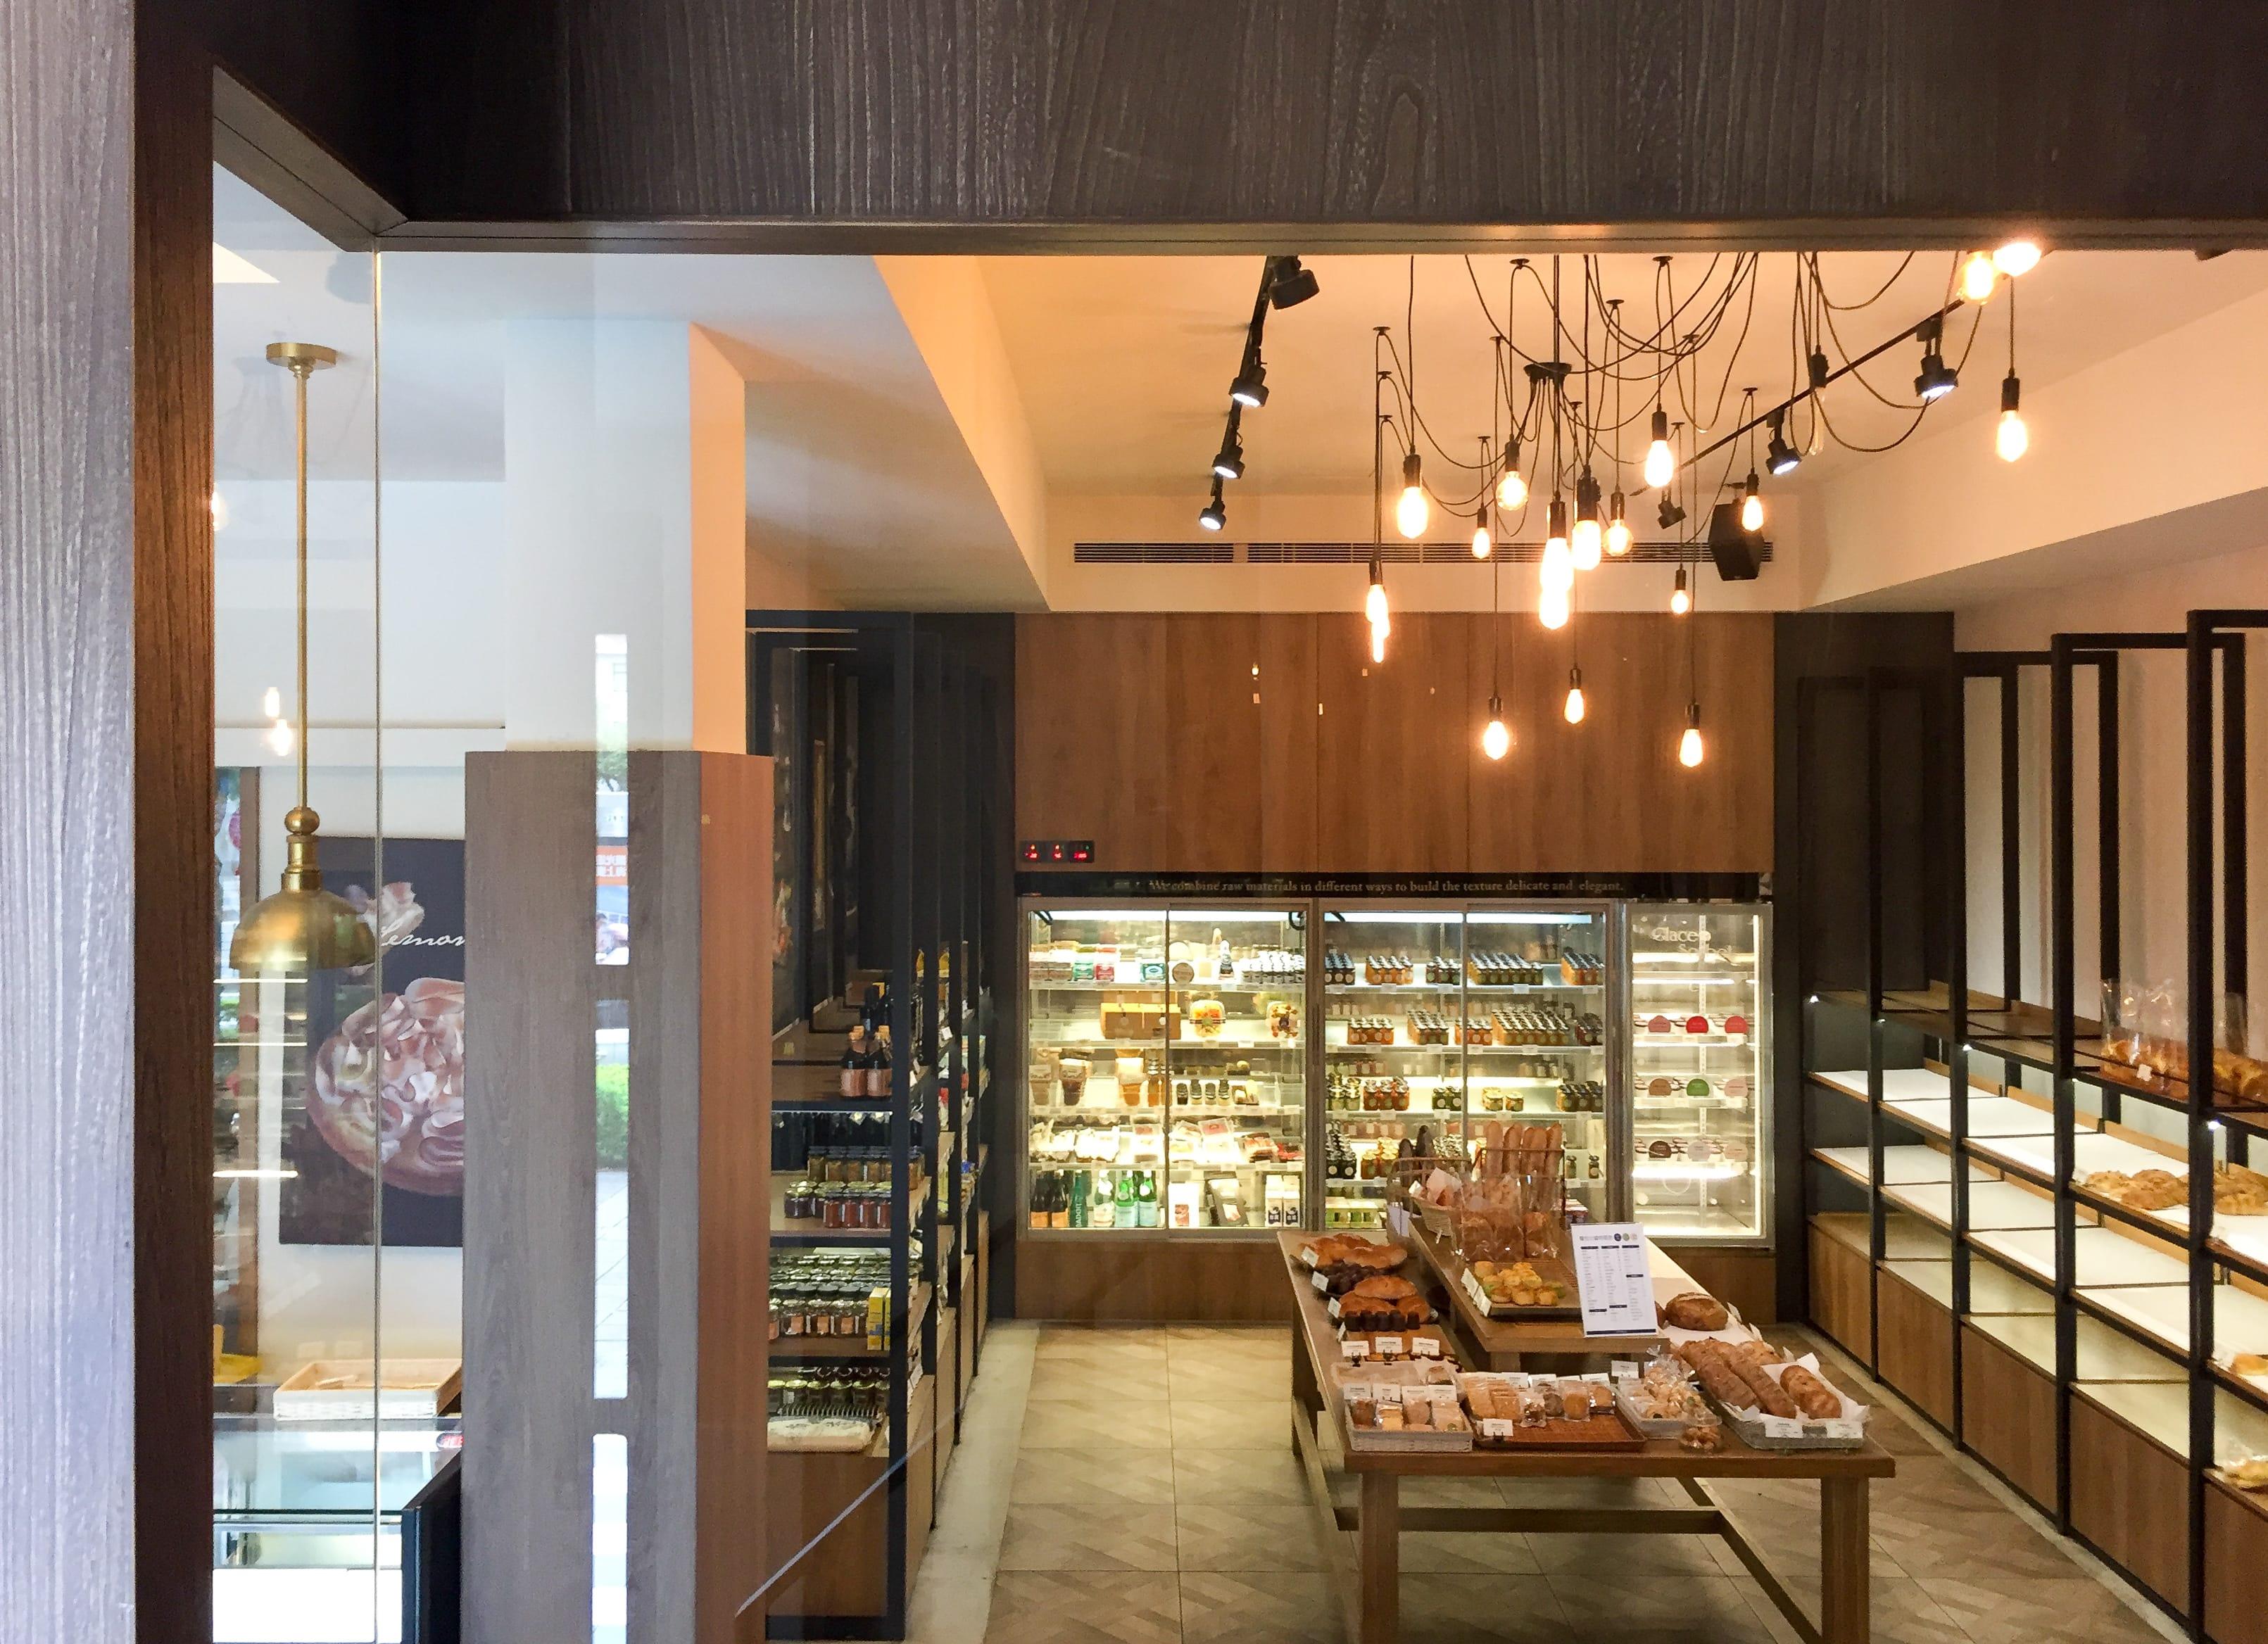 LA ONE Bakery on ground floor